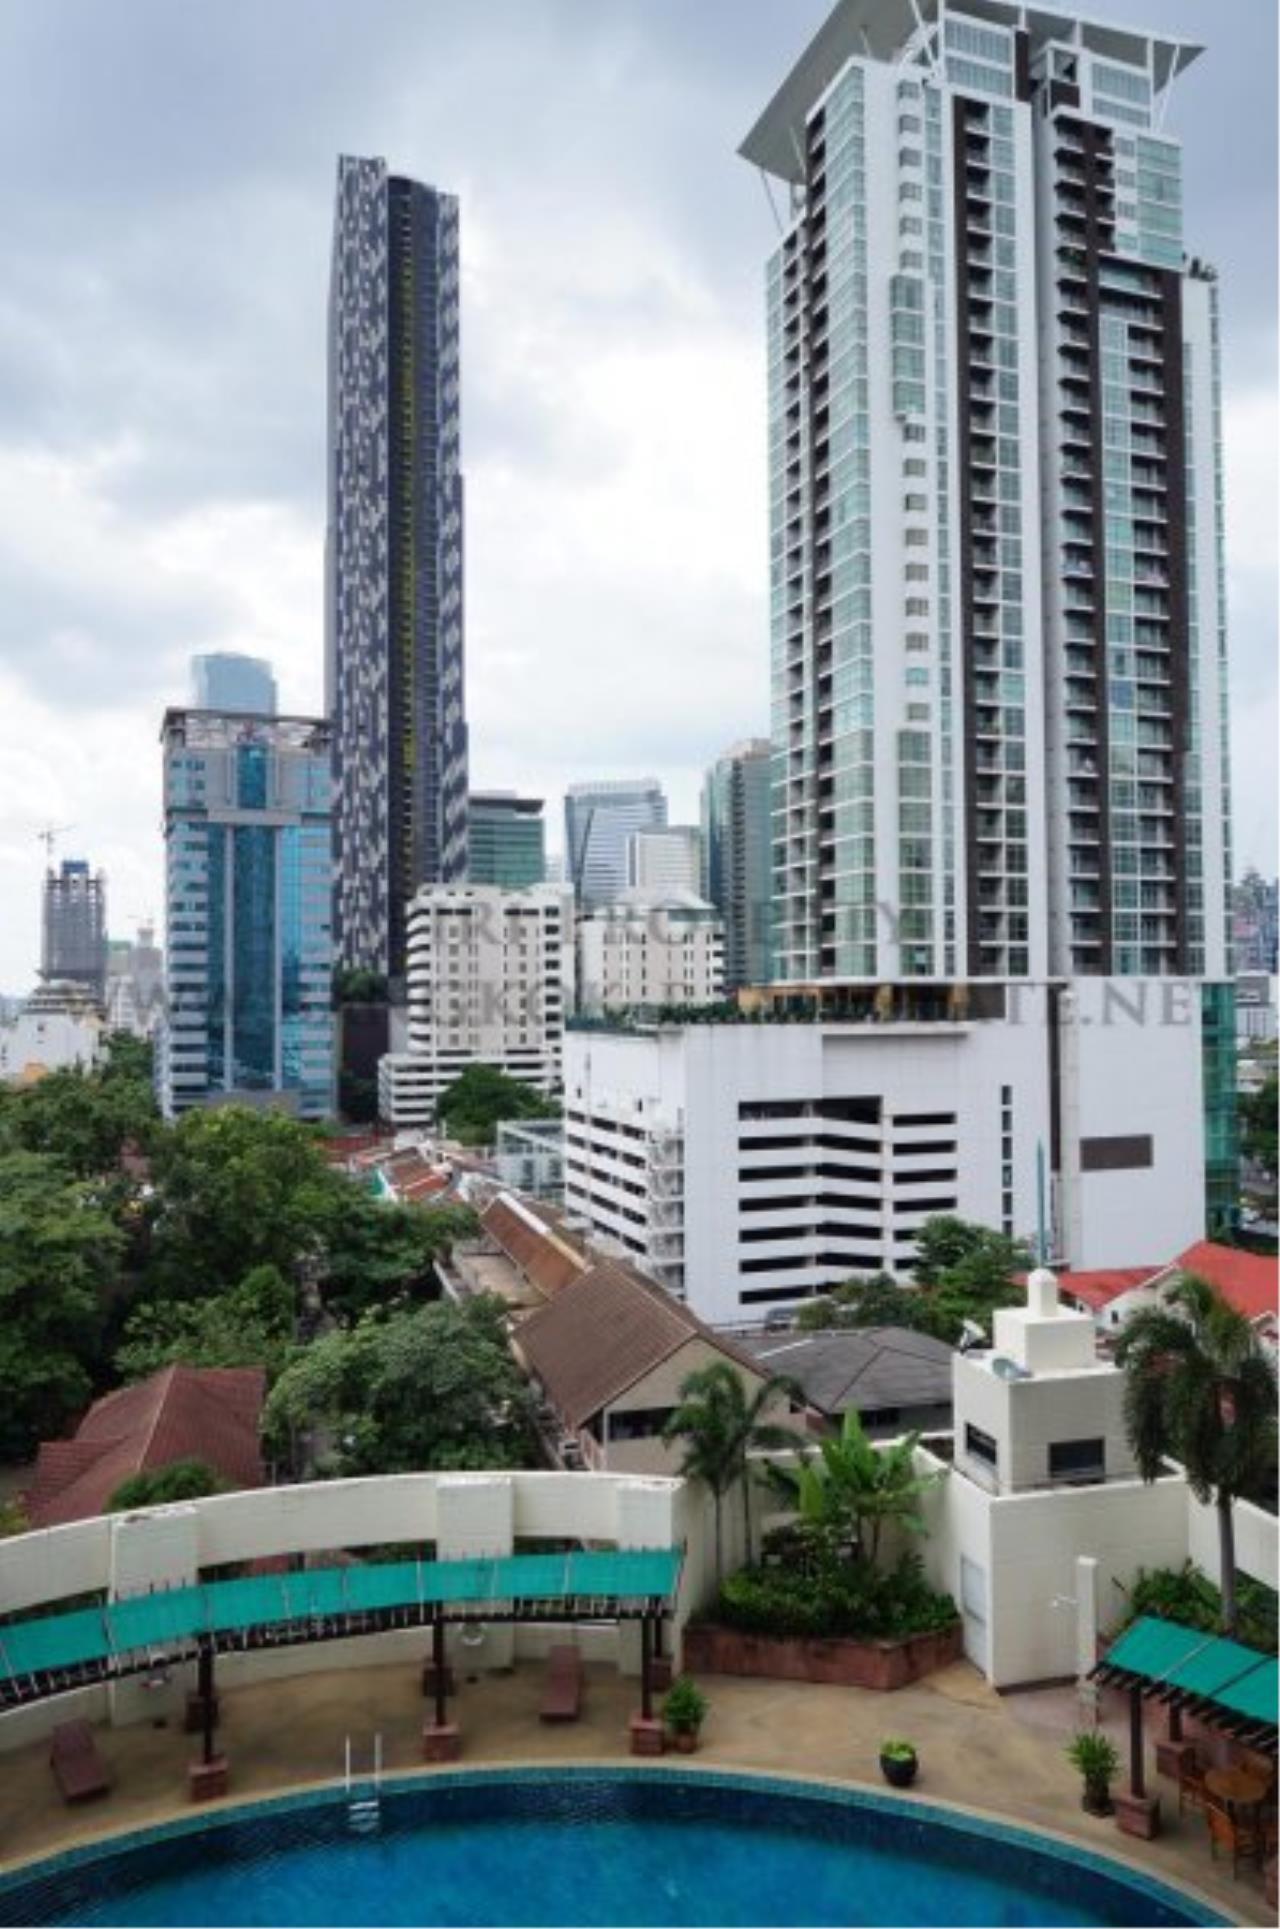 Piri Property Agency's Renovated Condo in Baan Piya Sathorn for Rent - 2 Bedrooms 14